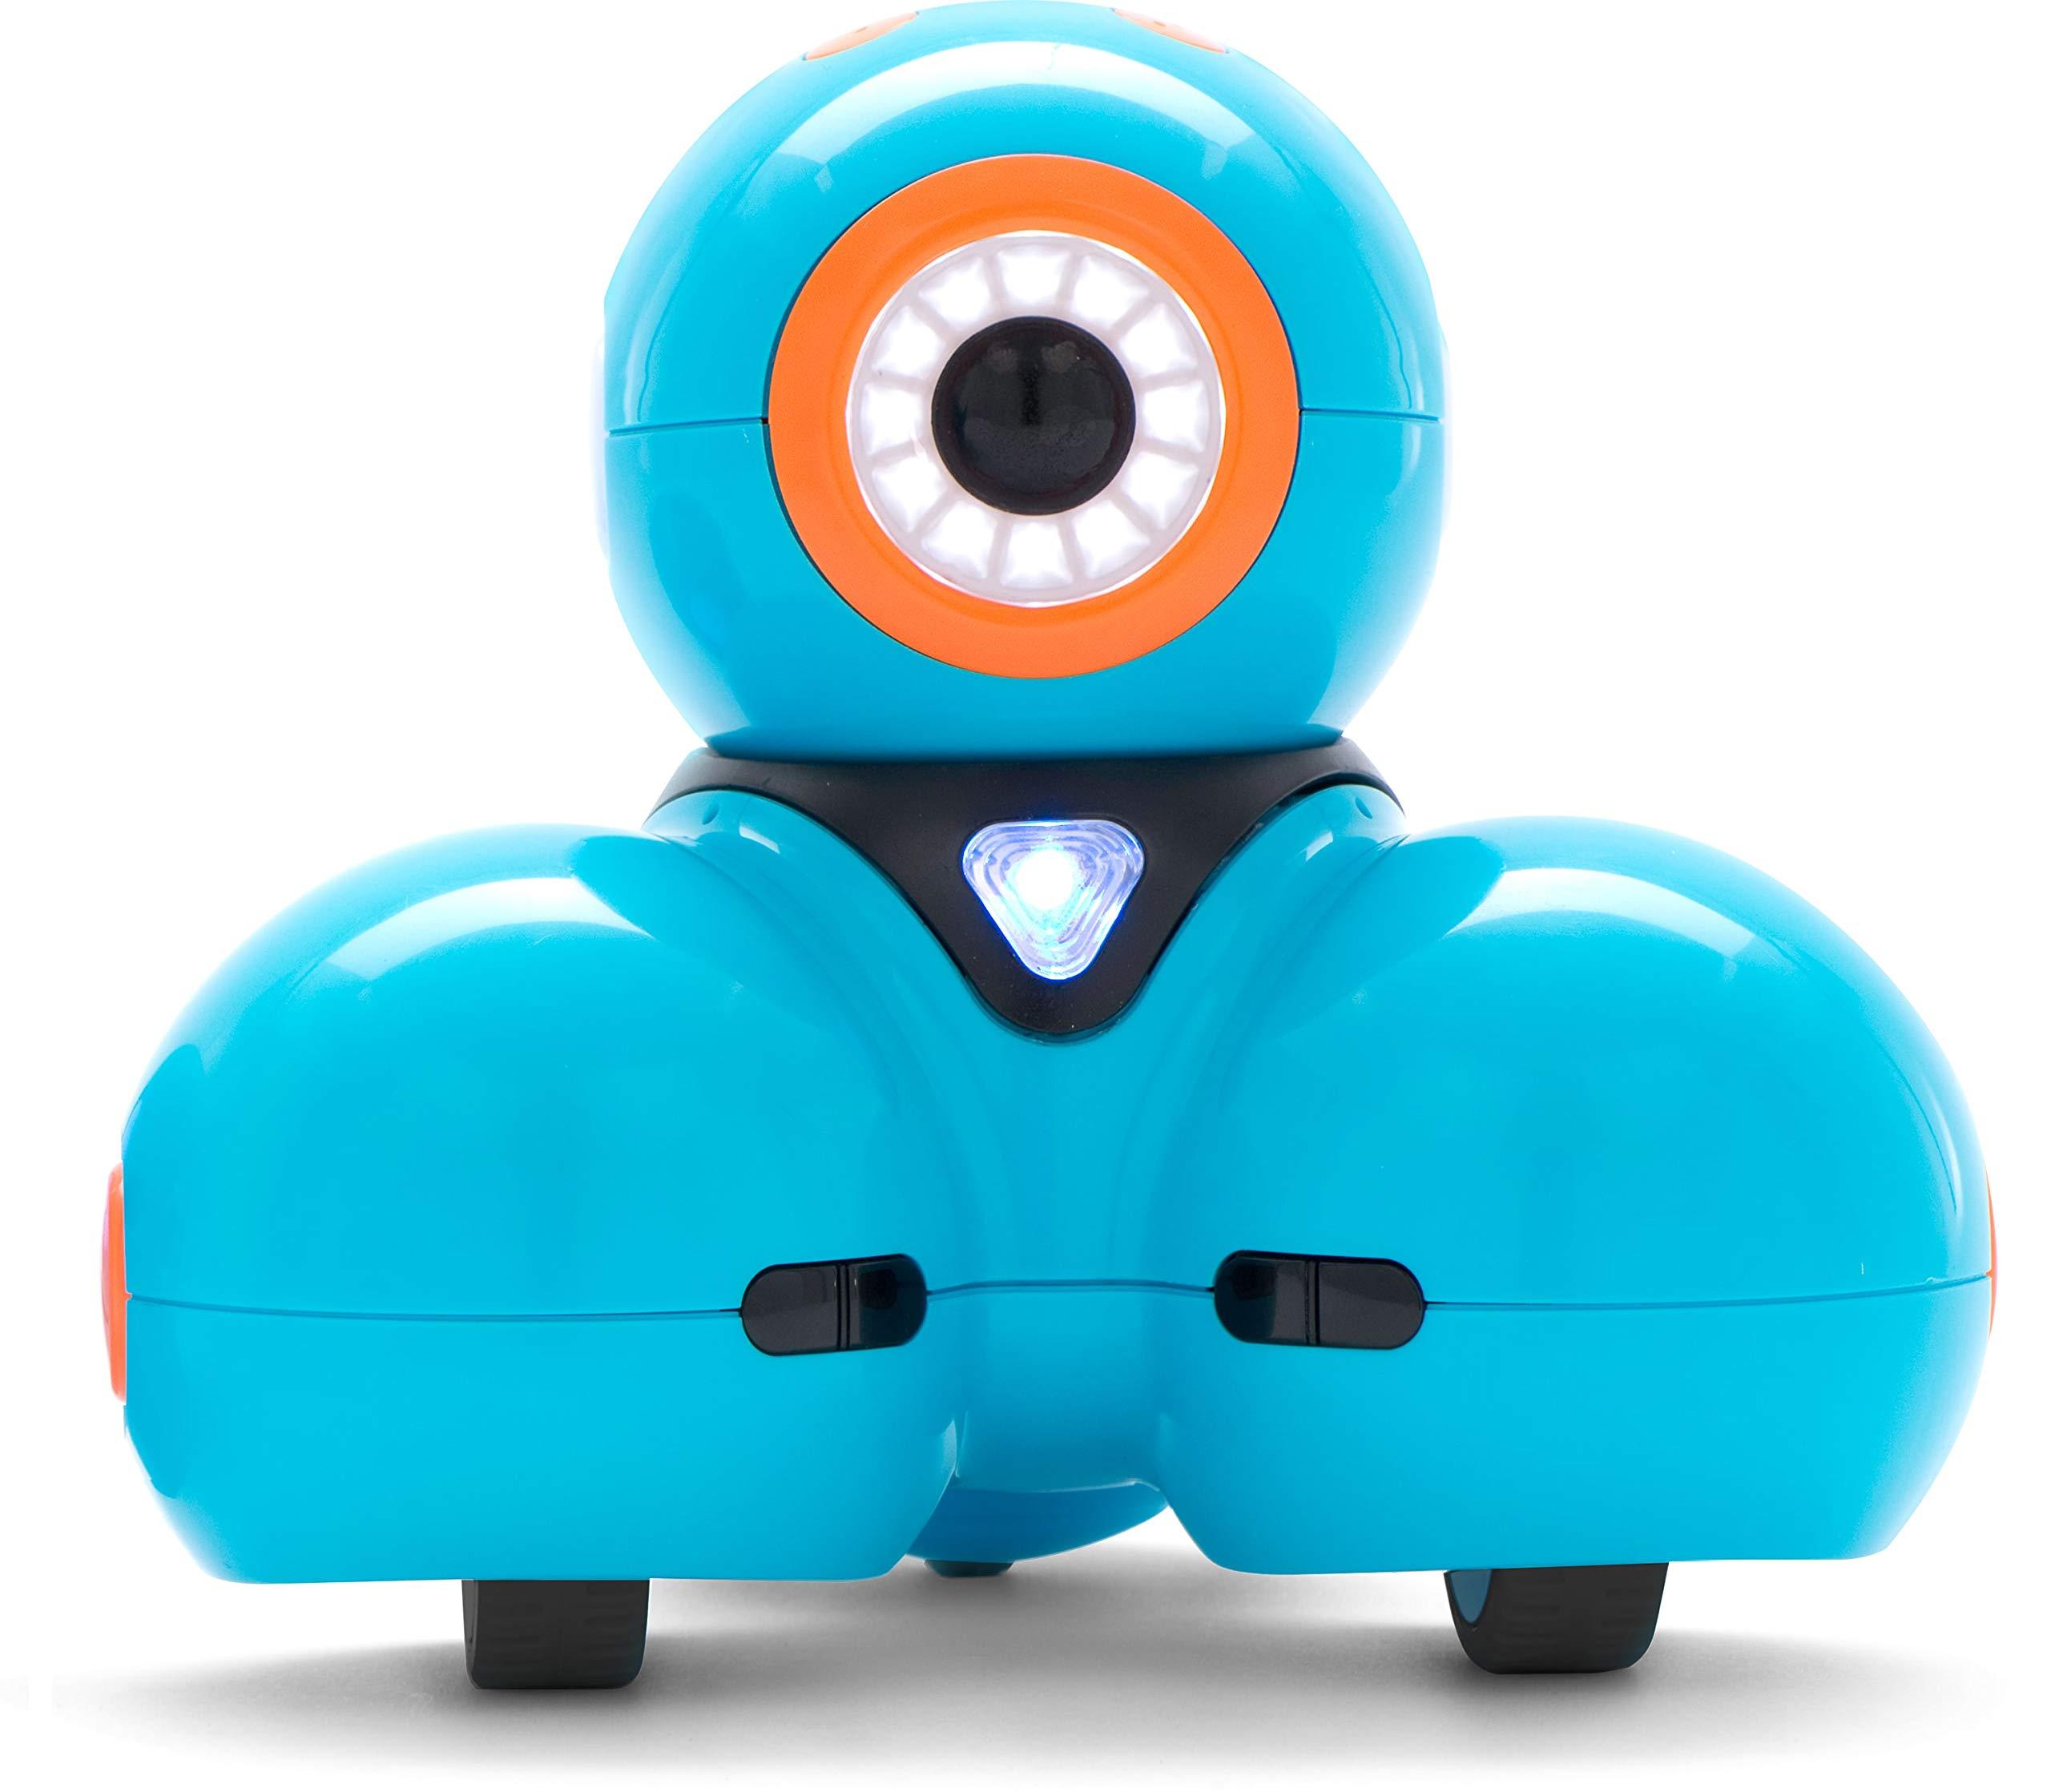 Wonder Workshop Dash – Coding Robot for Kids 6+ – Voice Activated – Navigates Objects – 5 Free Programming STEM Apps – Creating Confident Digital Citizens by Wonder Workshop (Image #3)